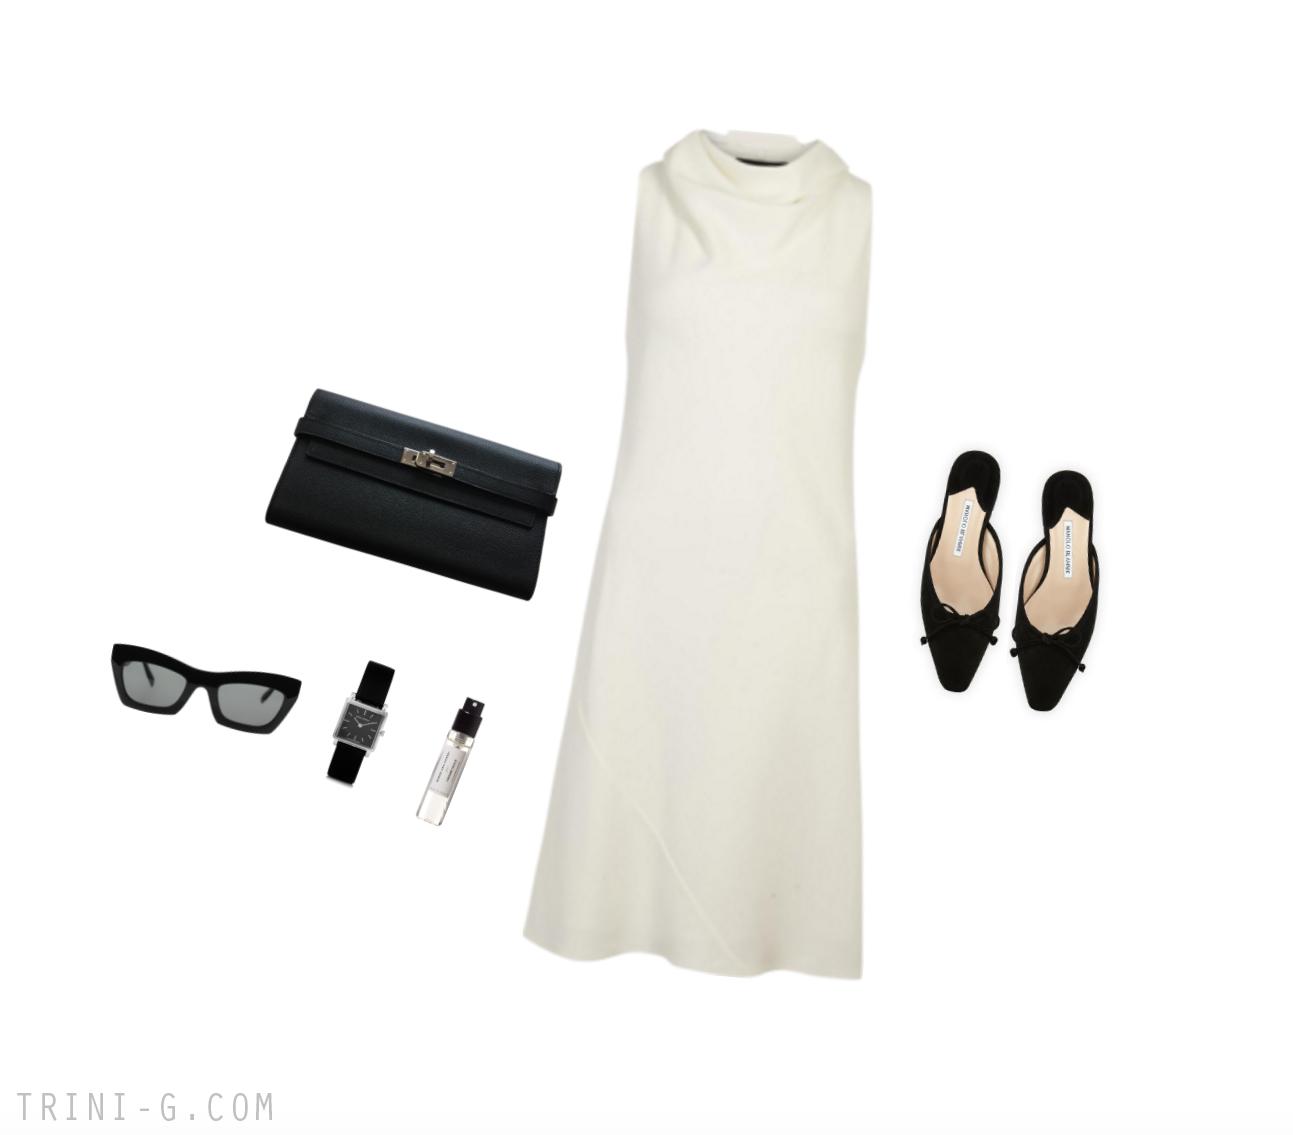 Trini | The Row dress Manolo Blahnik pumps Hermes bag